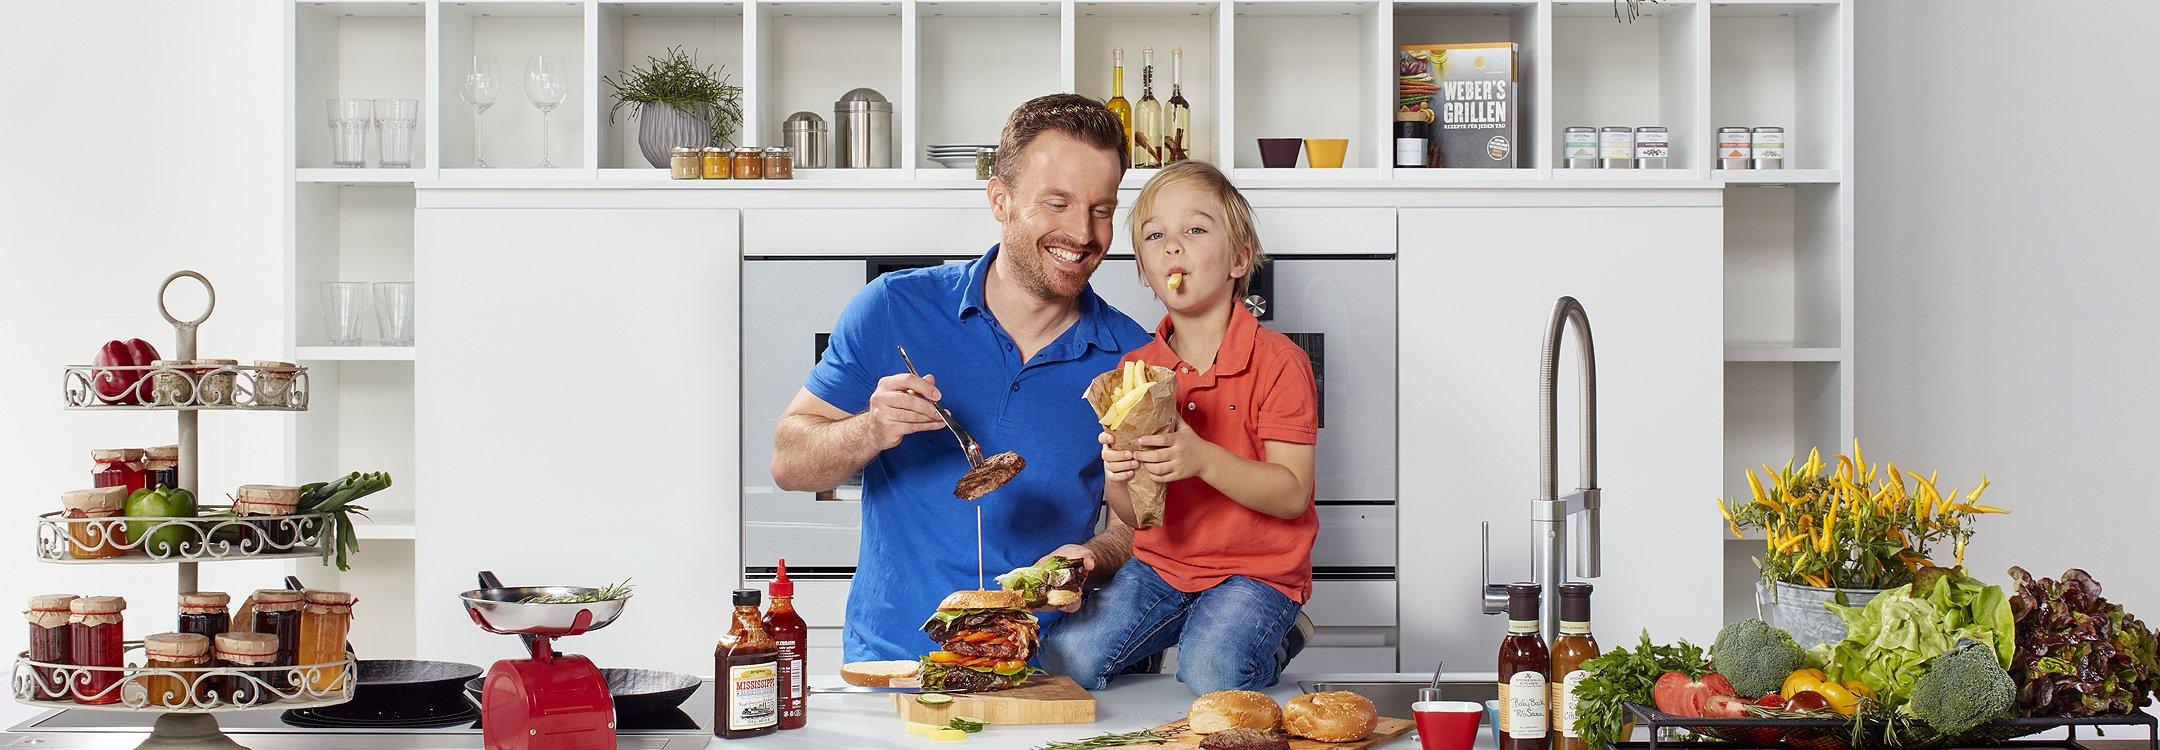 Dreiklang Vater und Sohn essen Burger